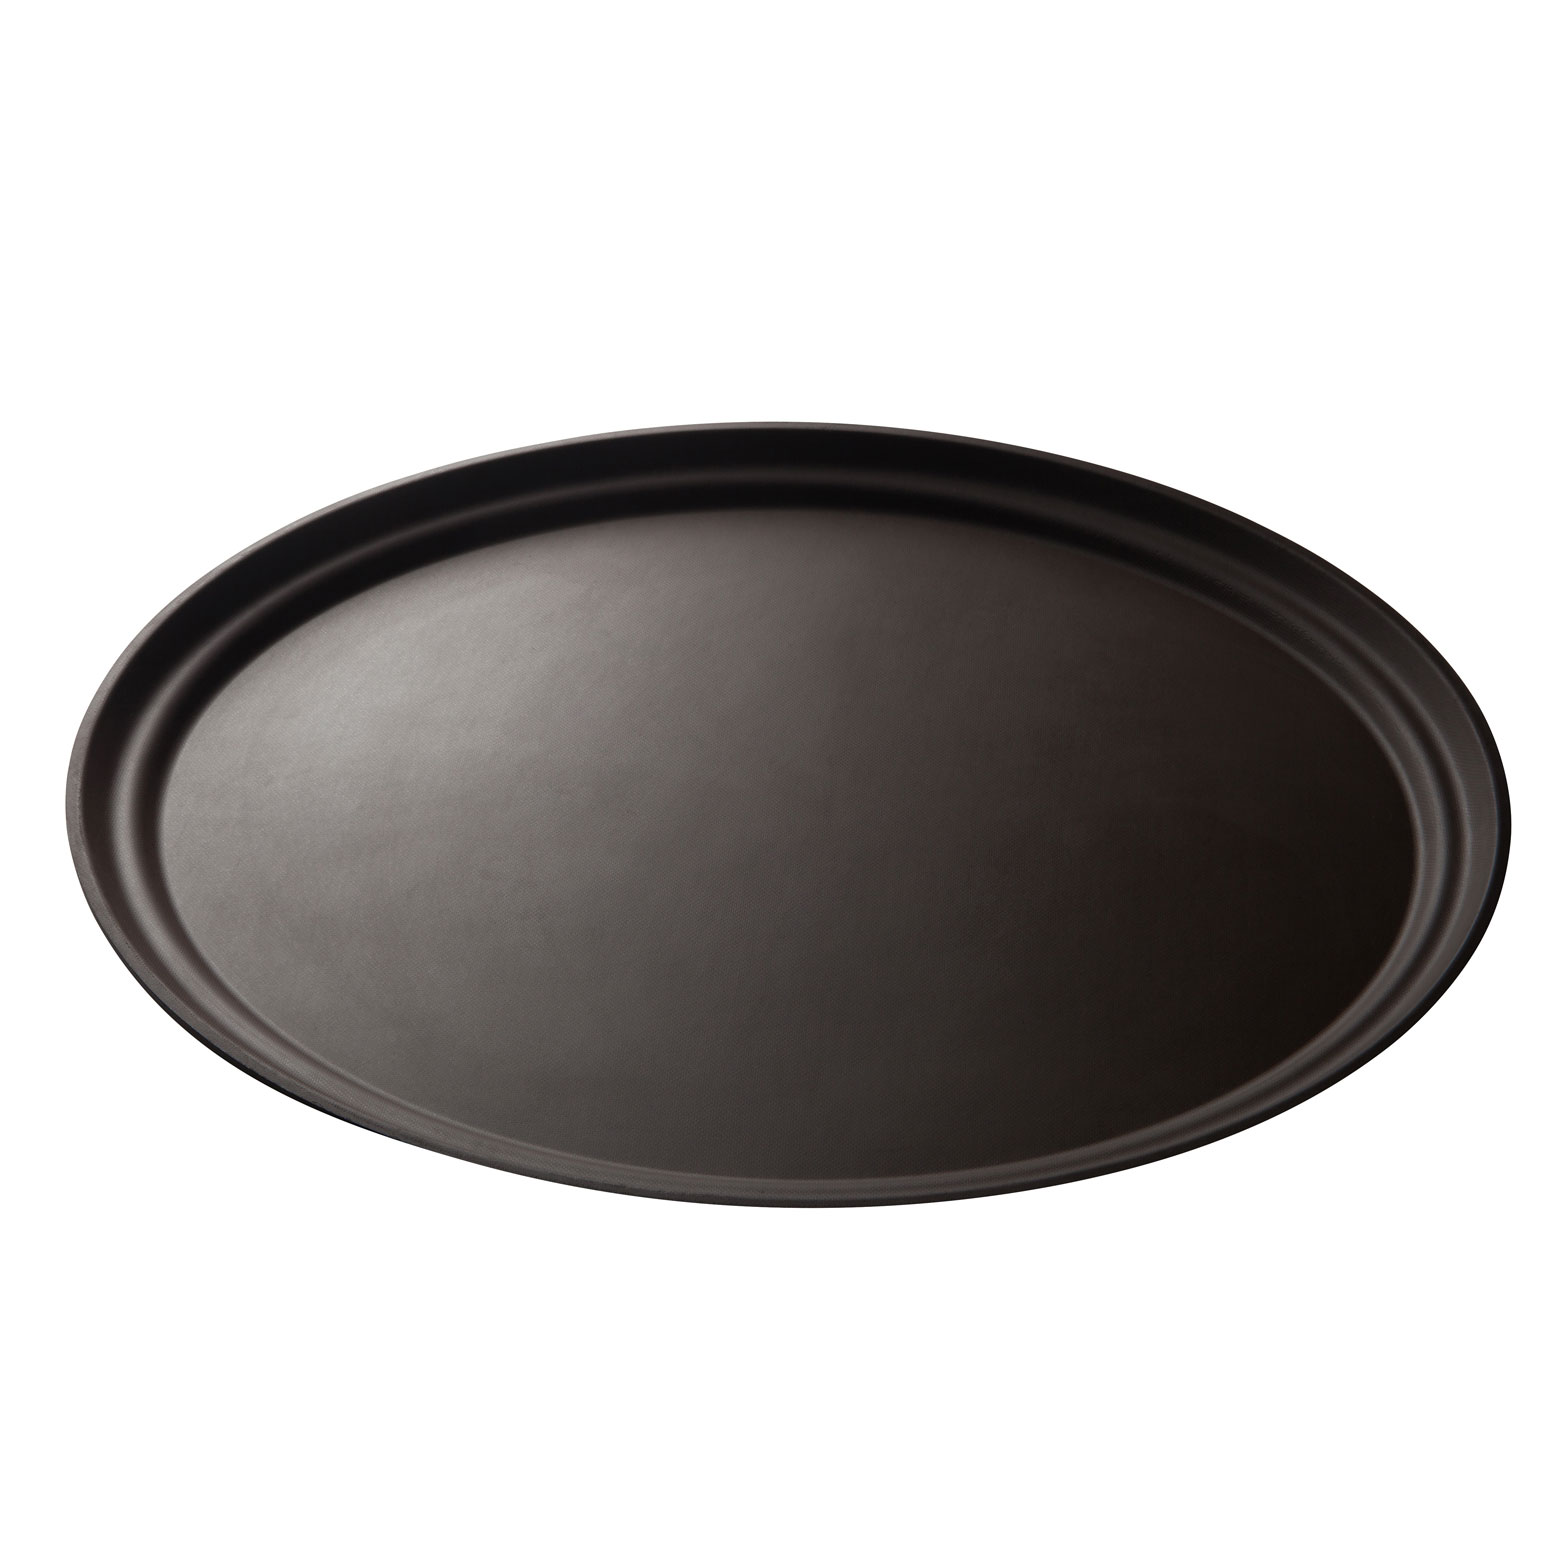 3150-123 Cambro 2900CT138 serving tray, non-skid